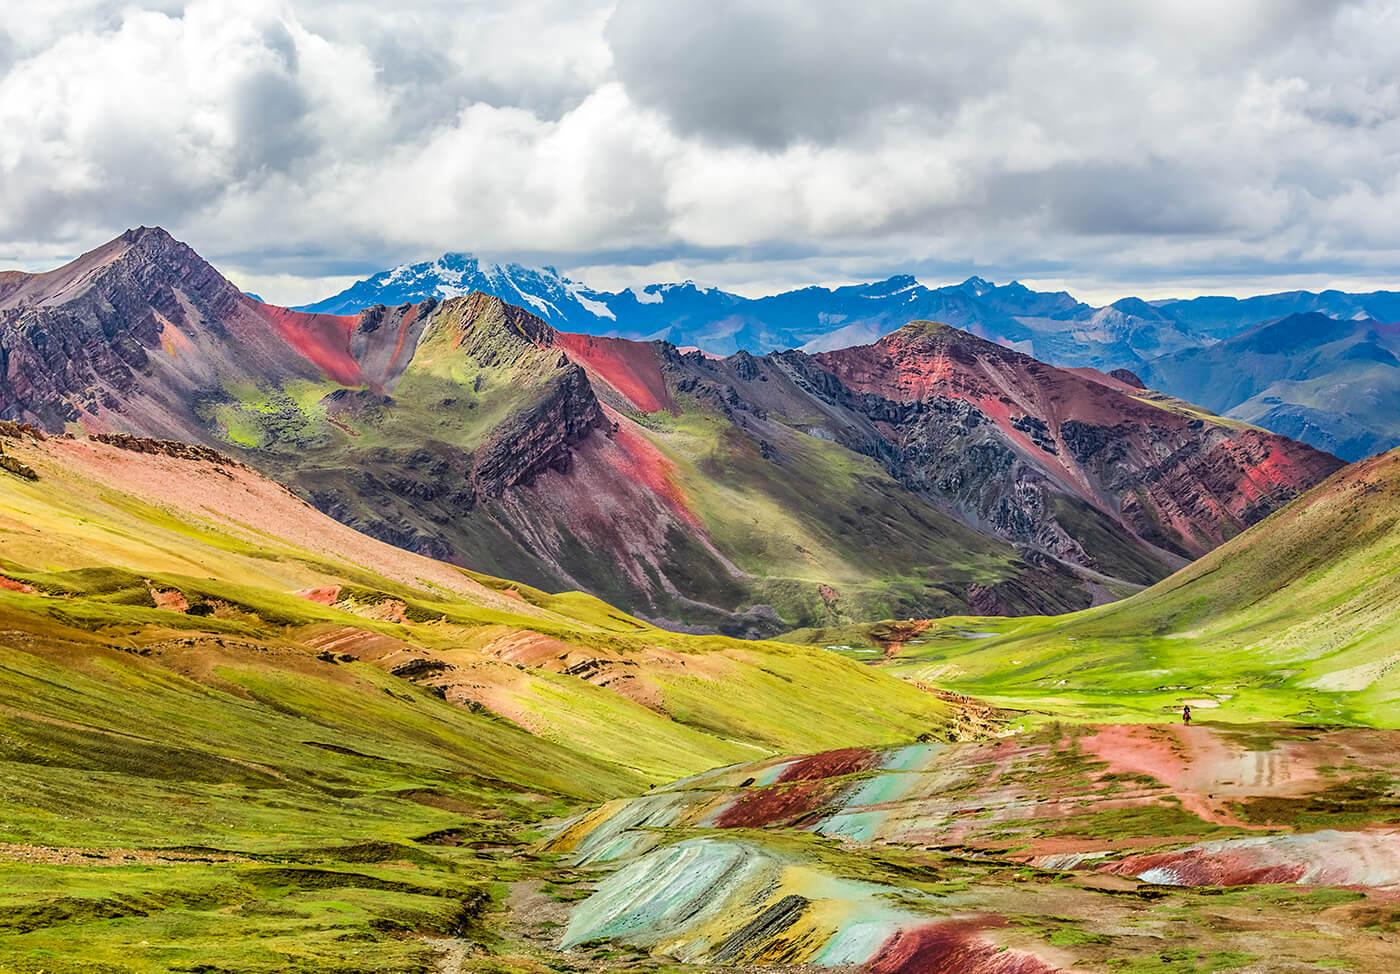 wallpaper of Rainbow Mountains